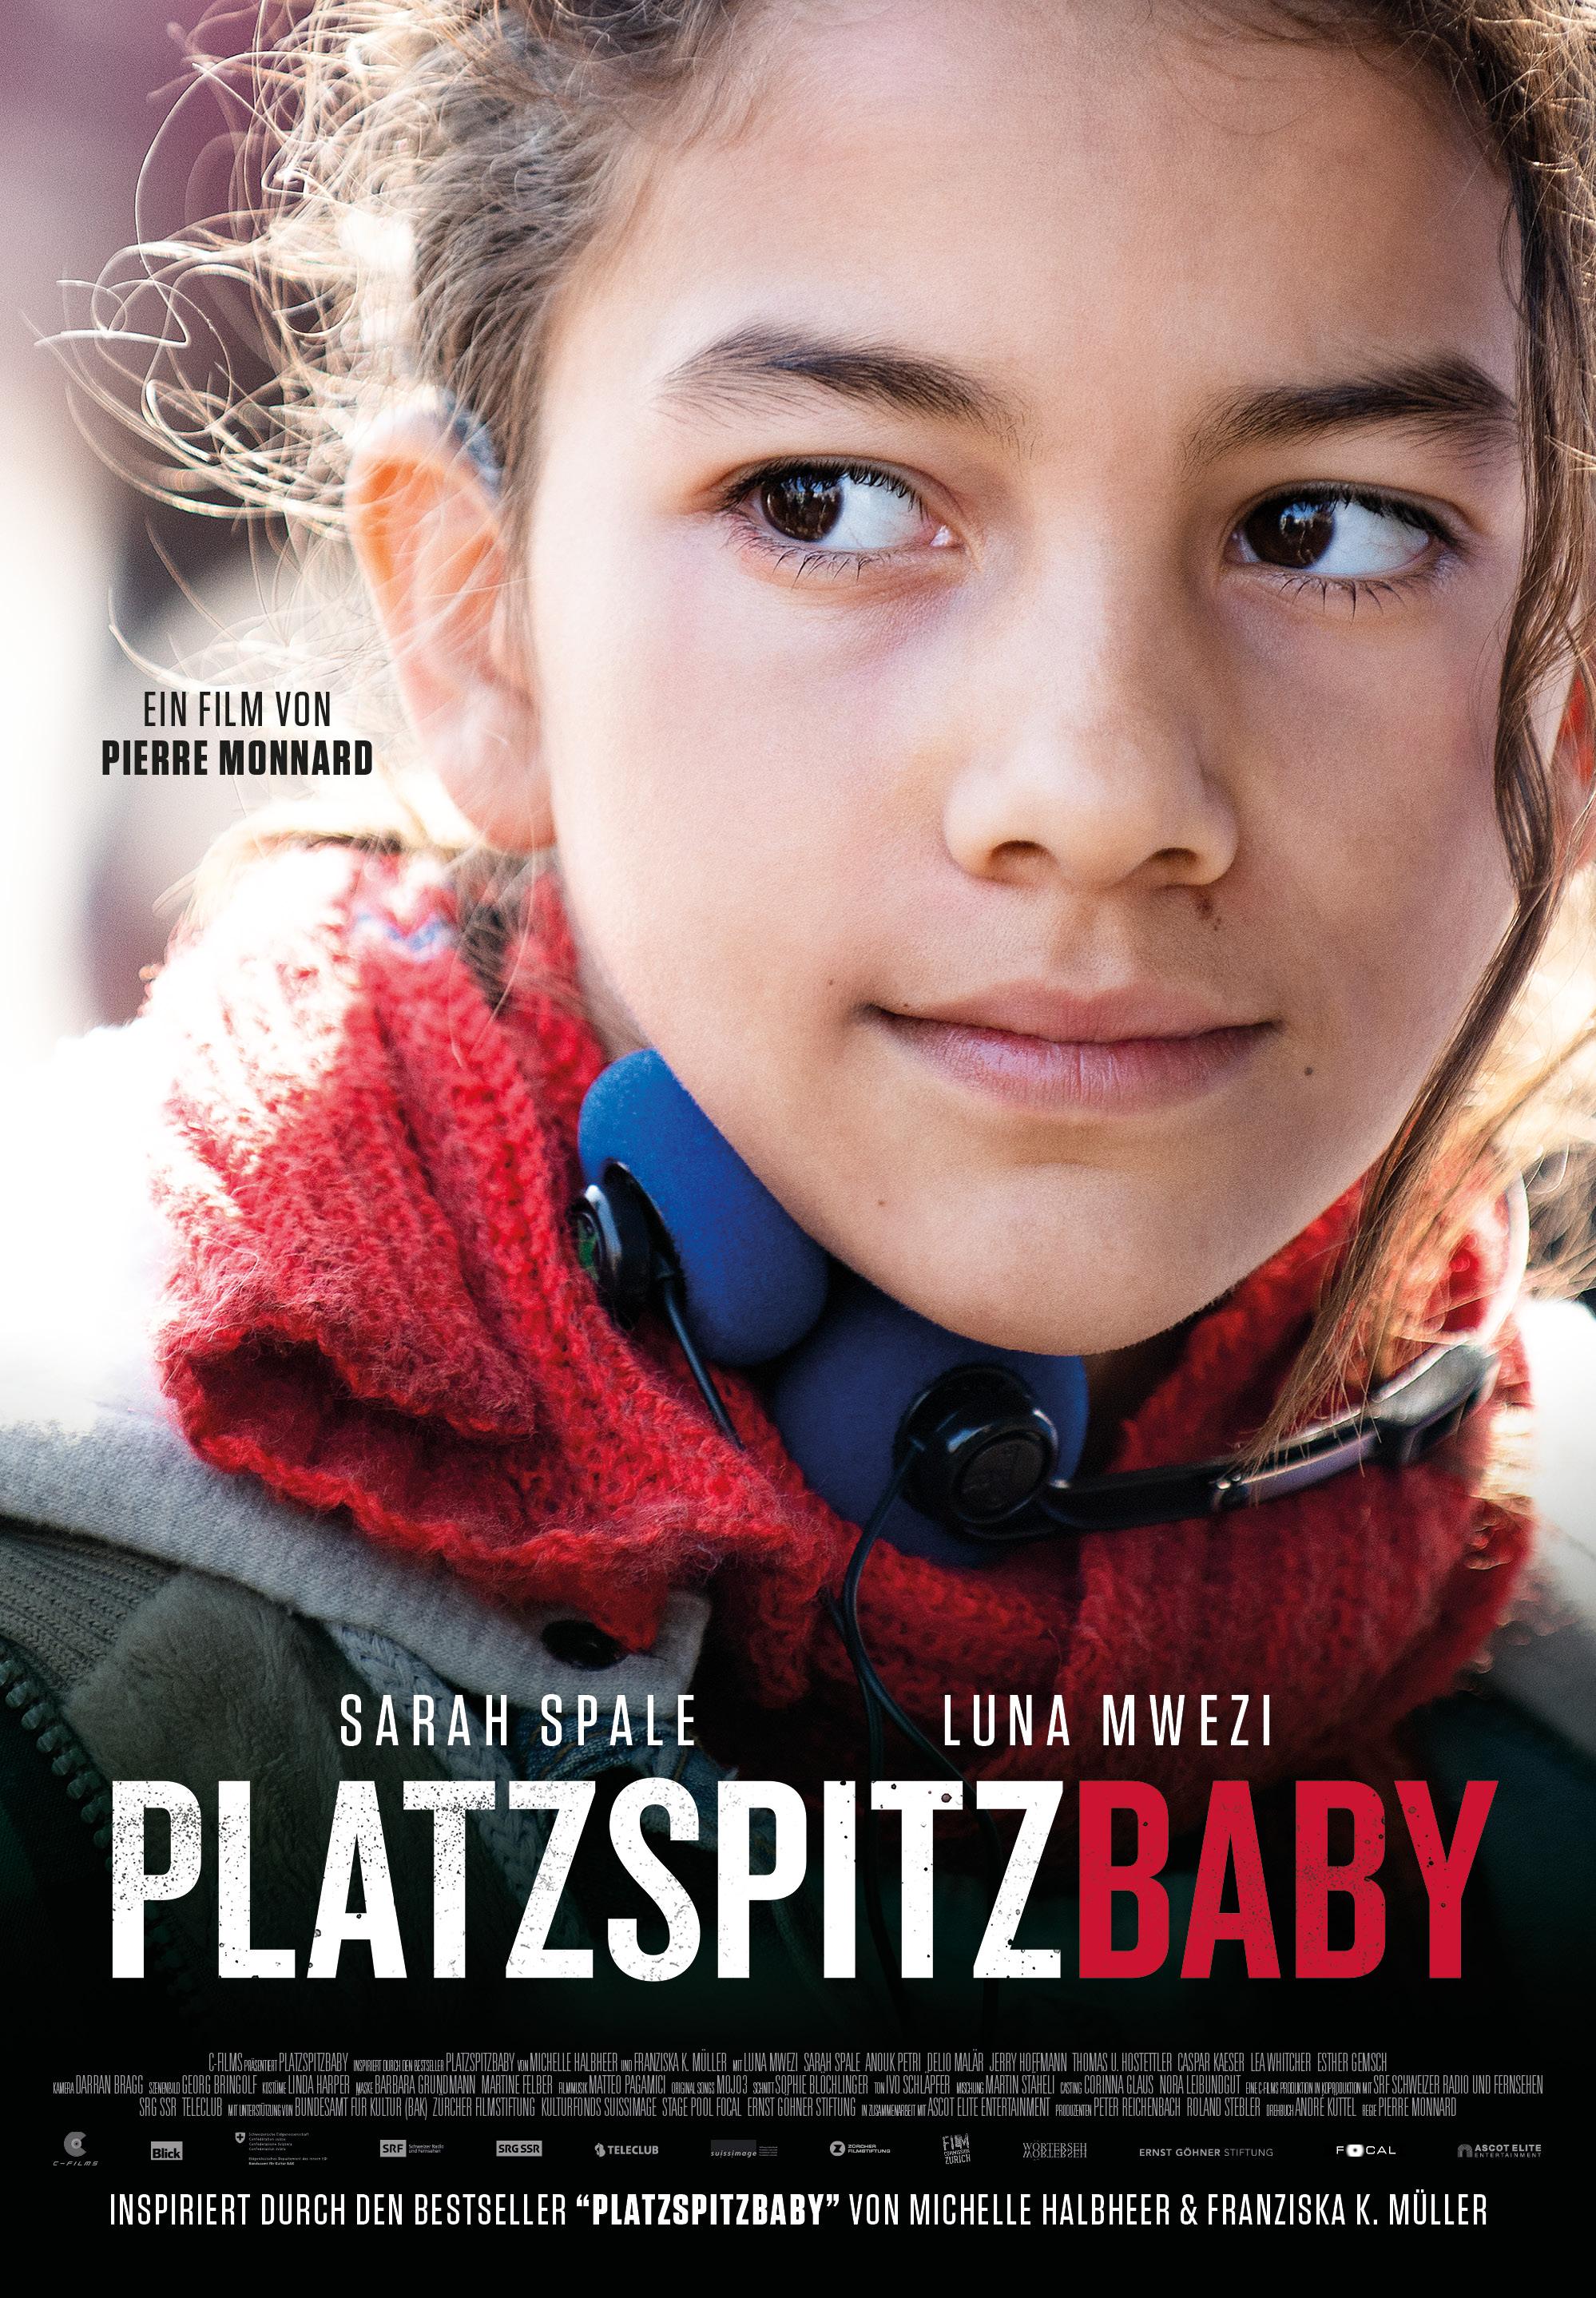 Platzspitzbaby_Hauptplakat_705x1015_4f